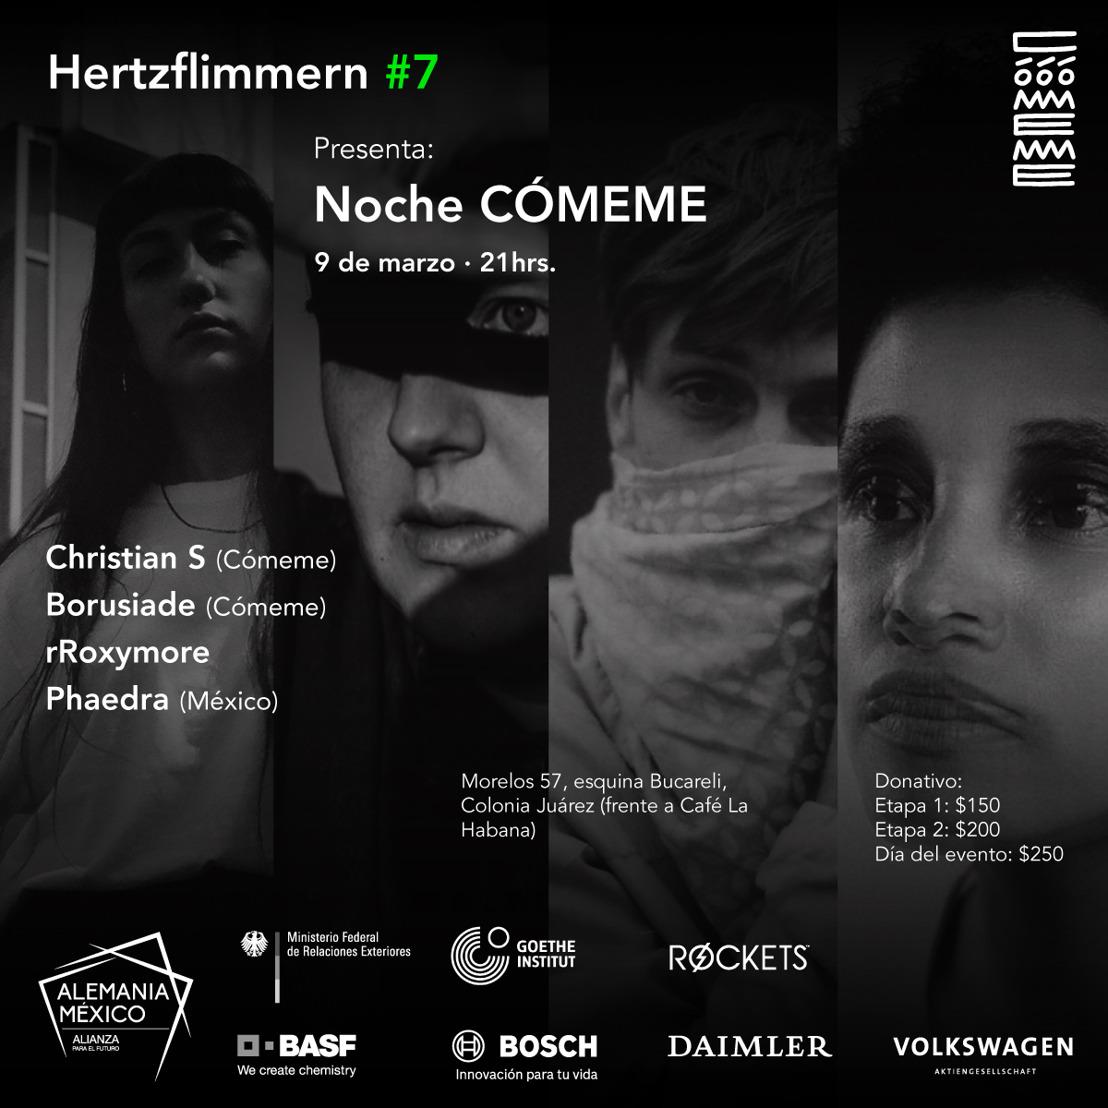 HERTZflimmern 7 presenta: Noche Cómeme